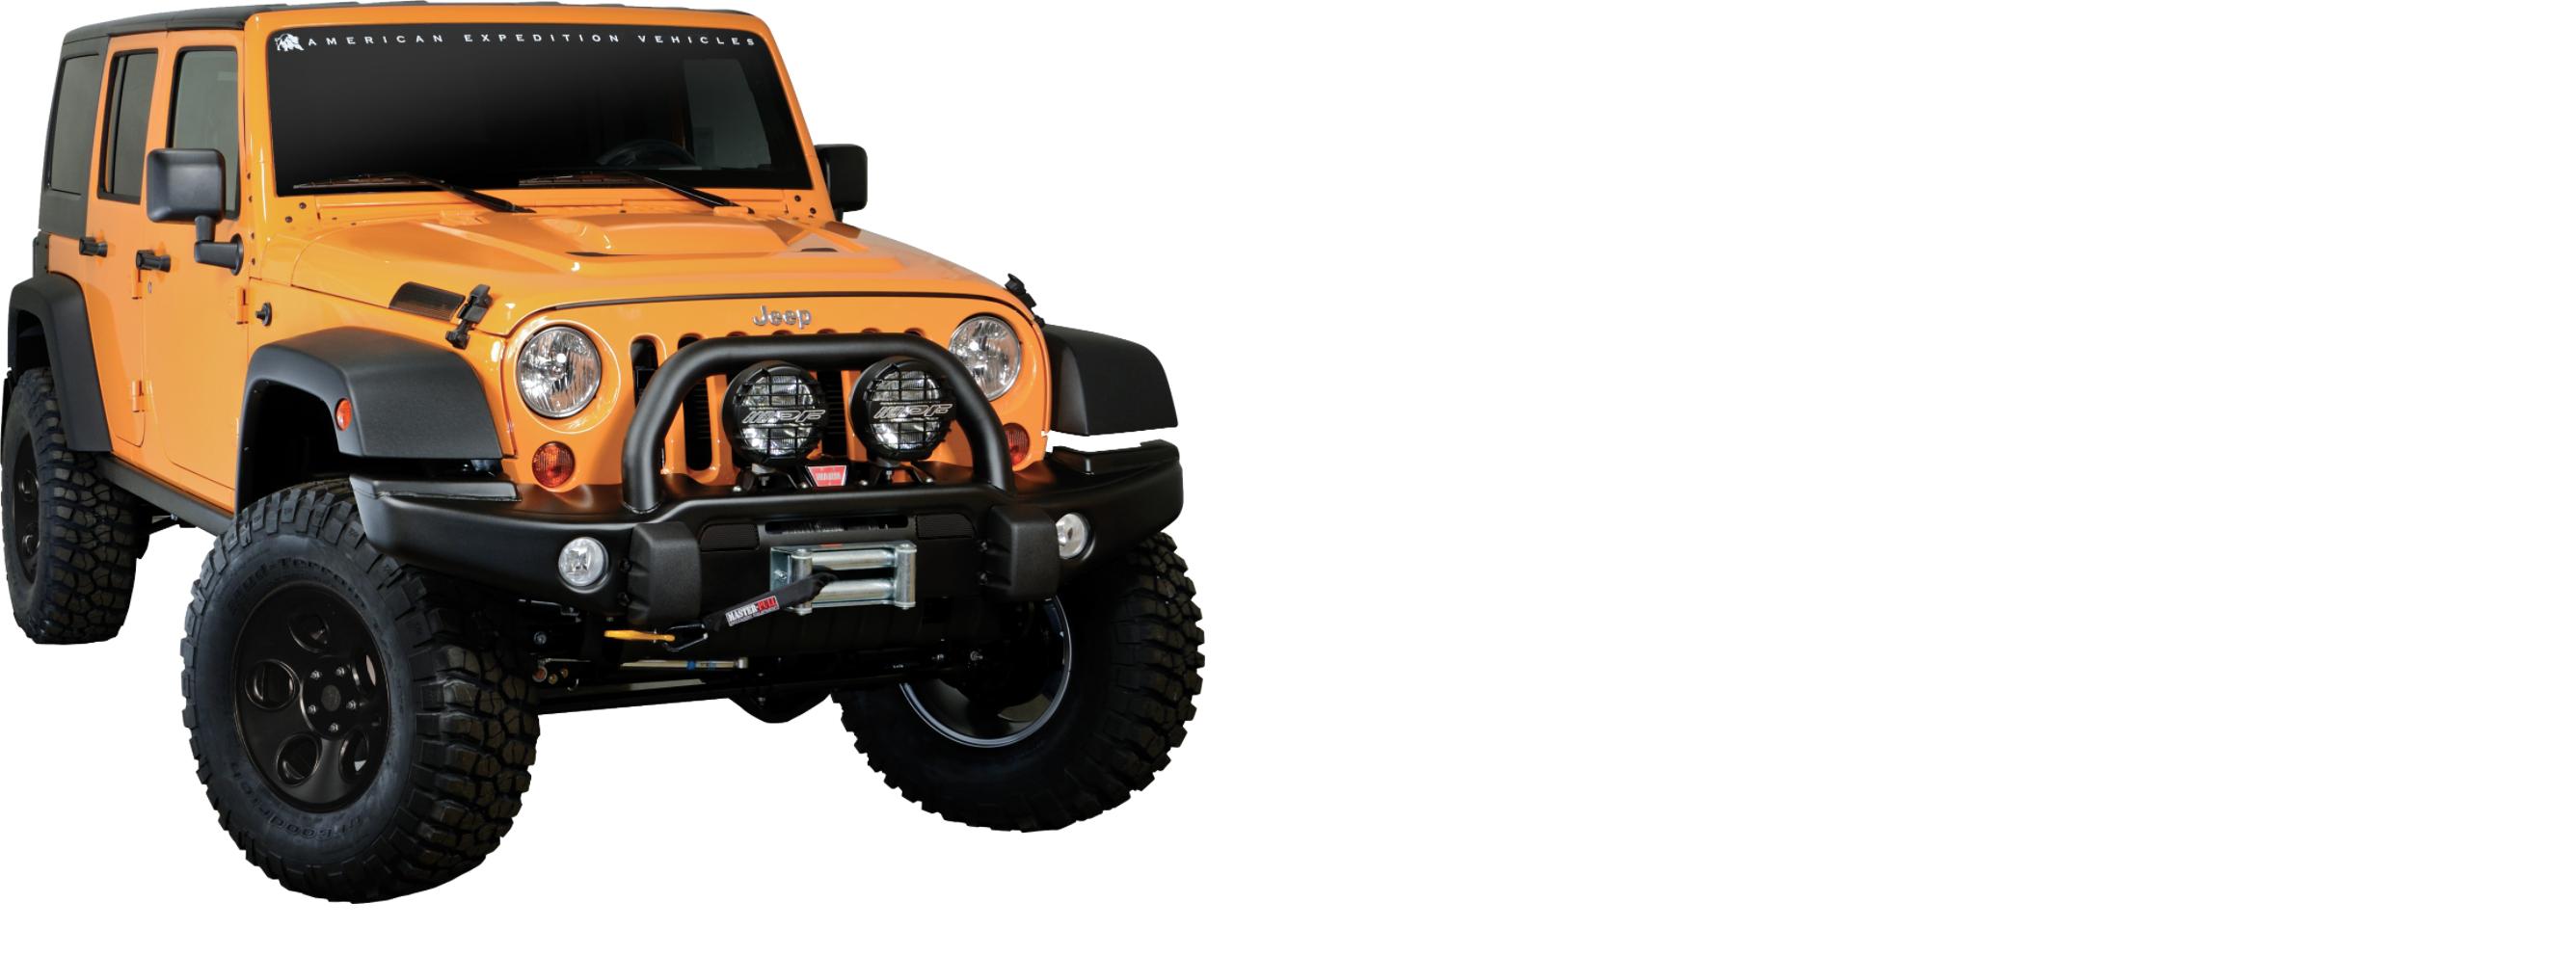 Aev Jeep Wrangler In Keene Nh Chrysler Dodge Ram Expedition Jk 350